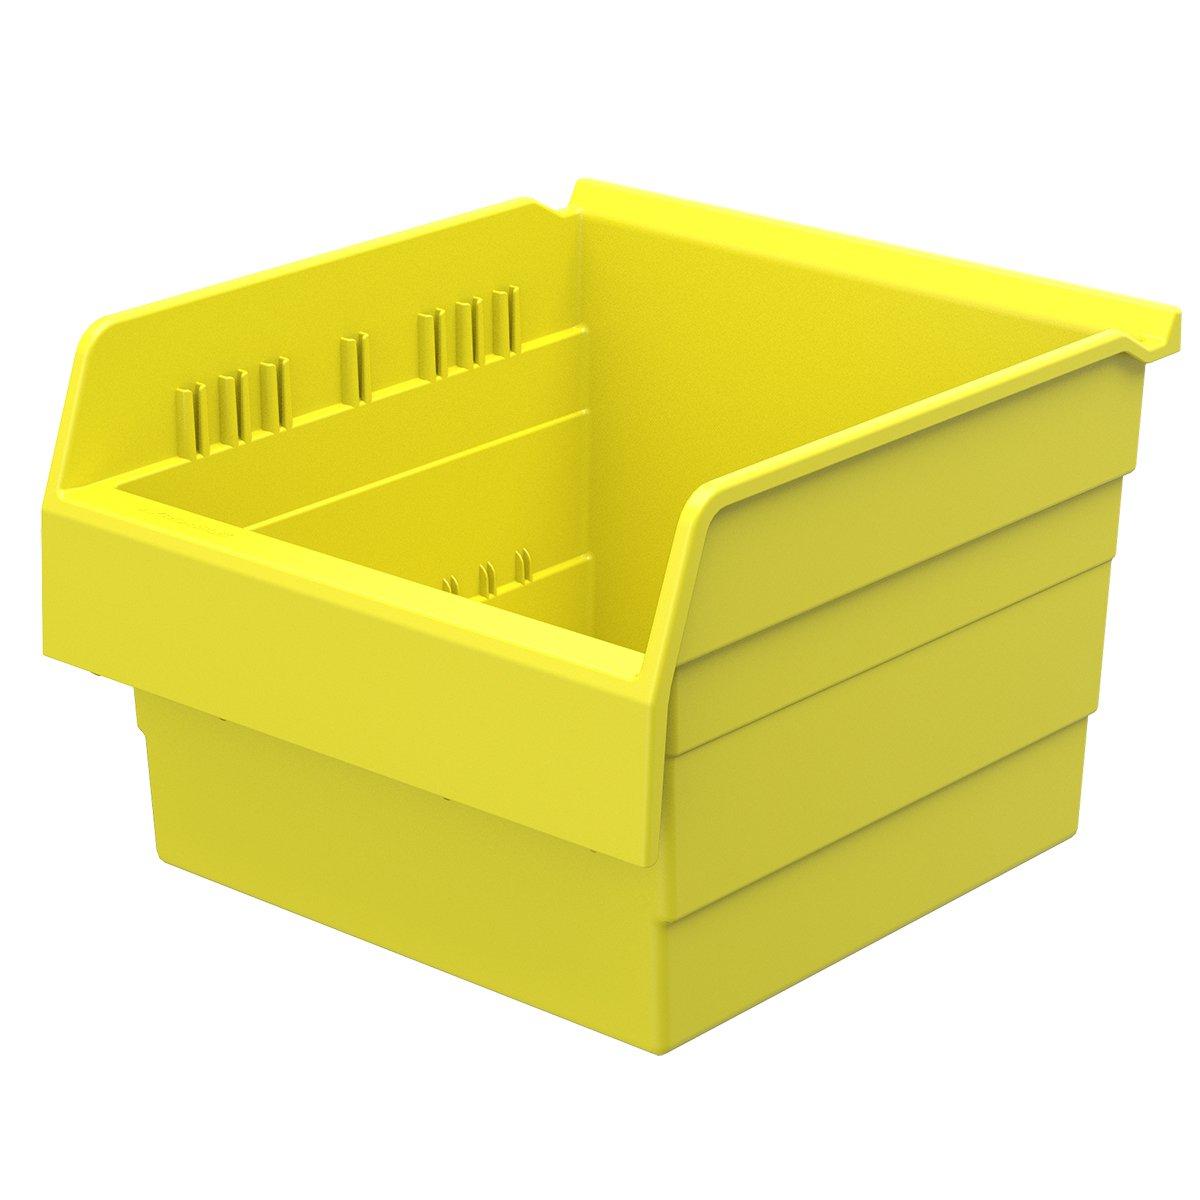 Akro-Mils 30800 ShelfMax 8 Plastic Nesting Shelf Bin Box, 12-Inch x 11-Inch x 8-Inch, Yellow, 4-Pack